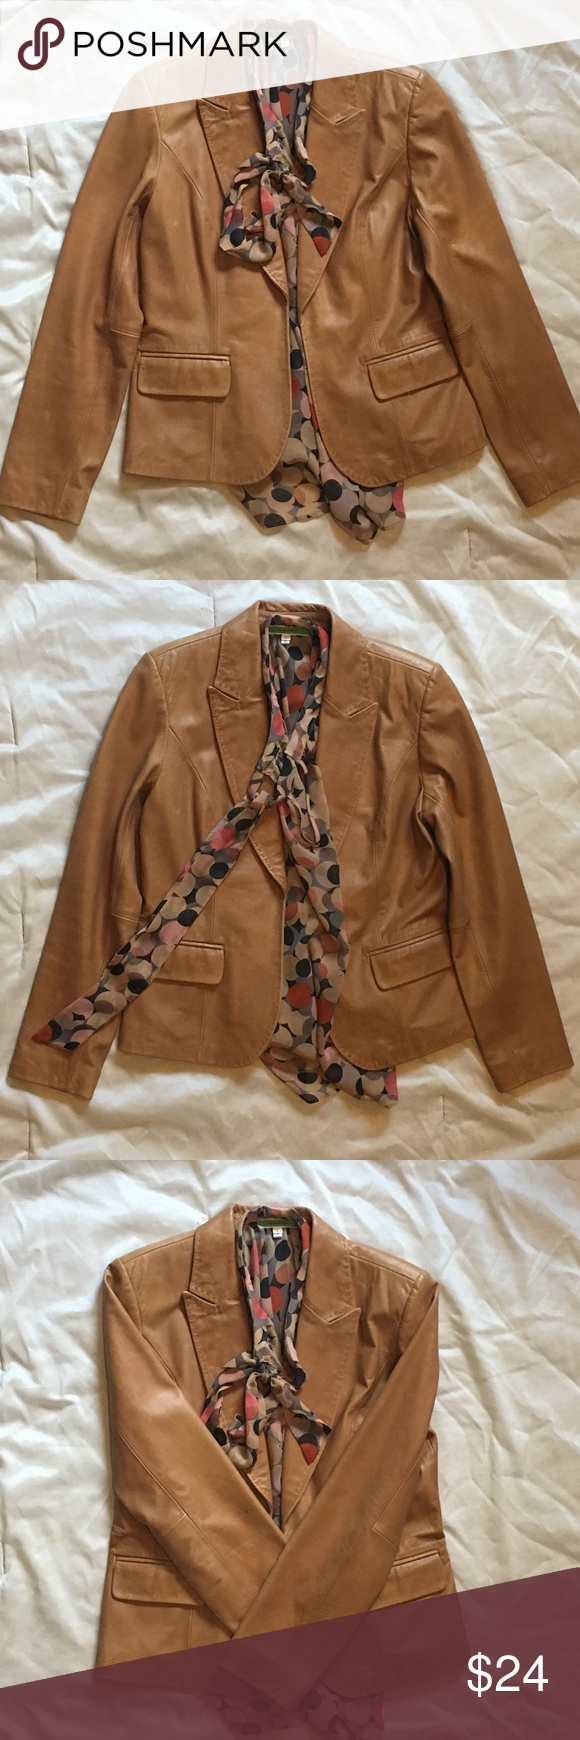 "HALLOWEEN SALE 👻 Macy's ""INC"" Leather Jacket Genuine"